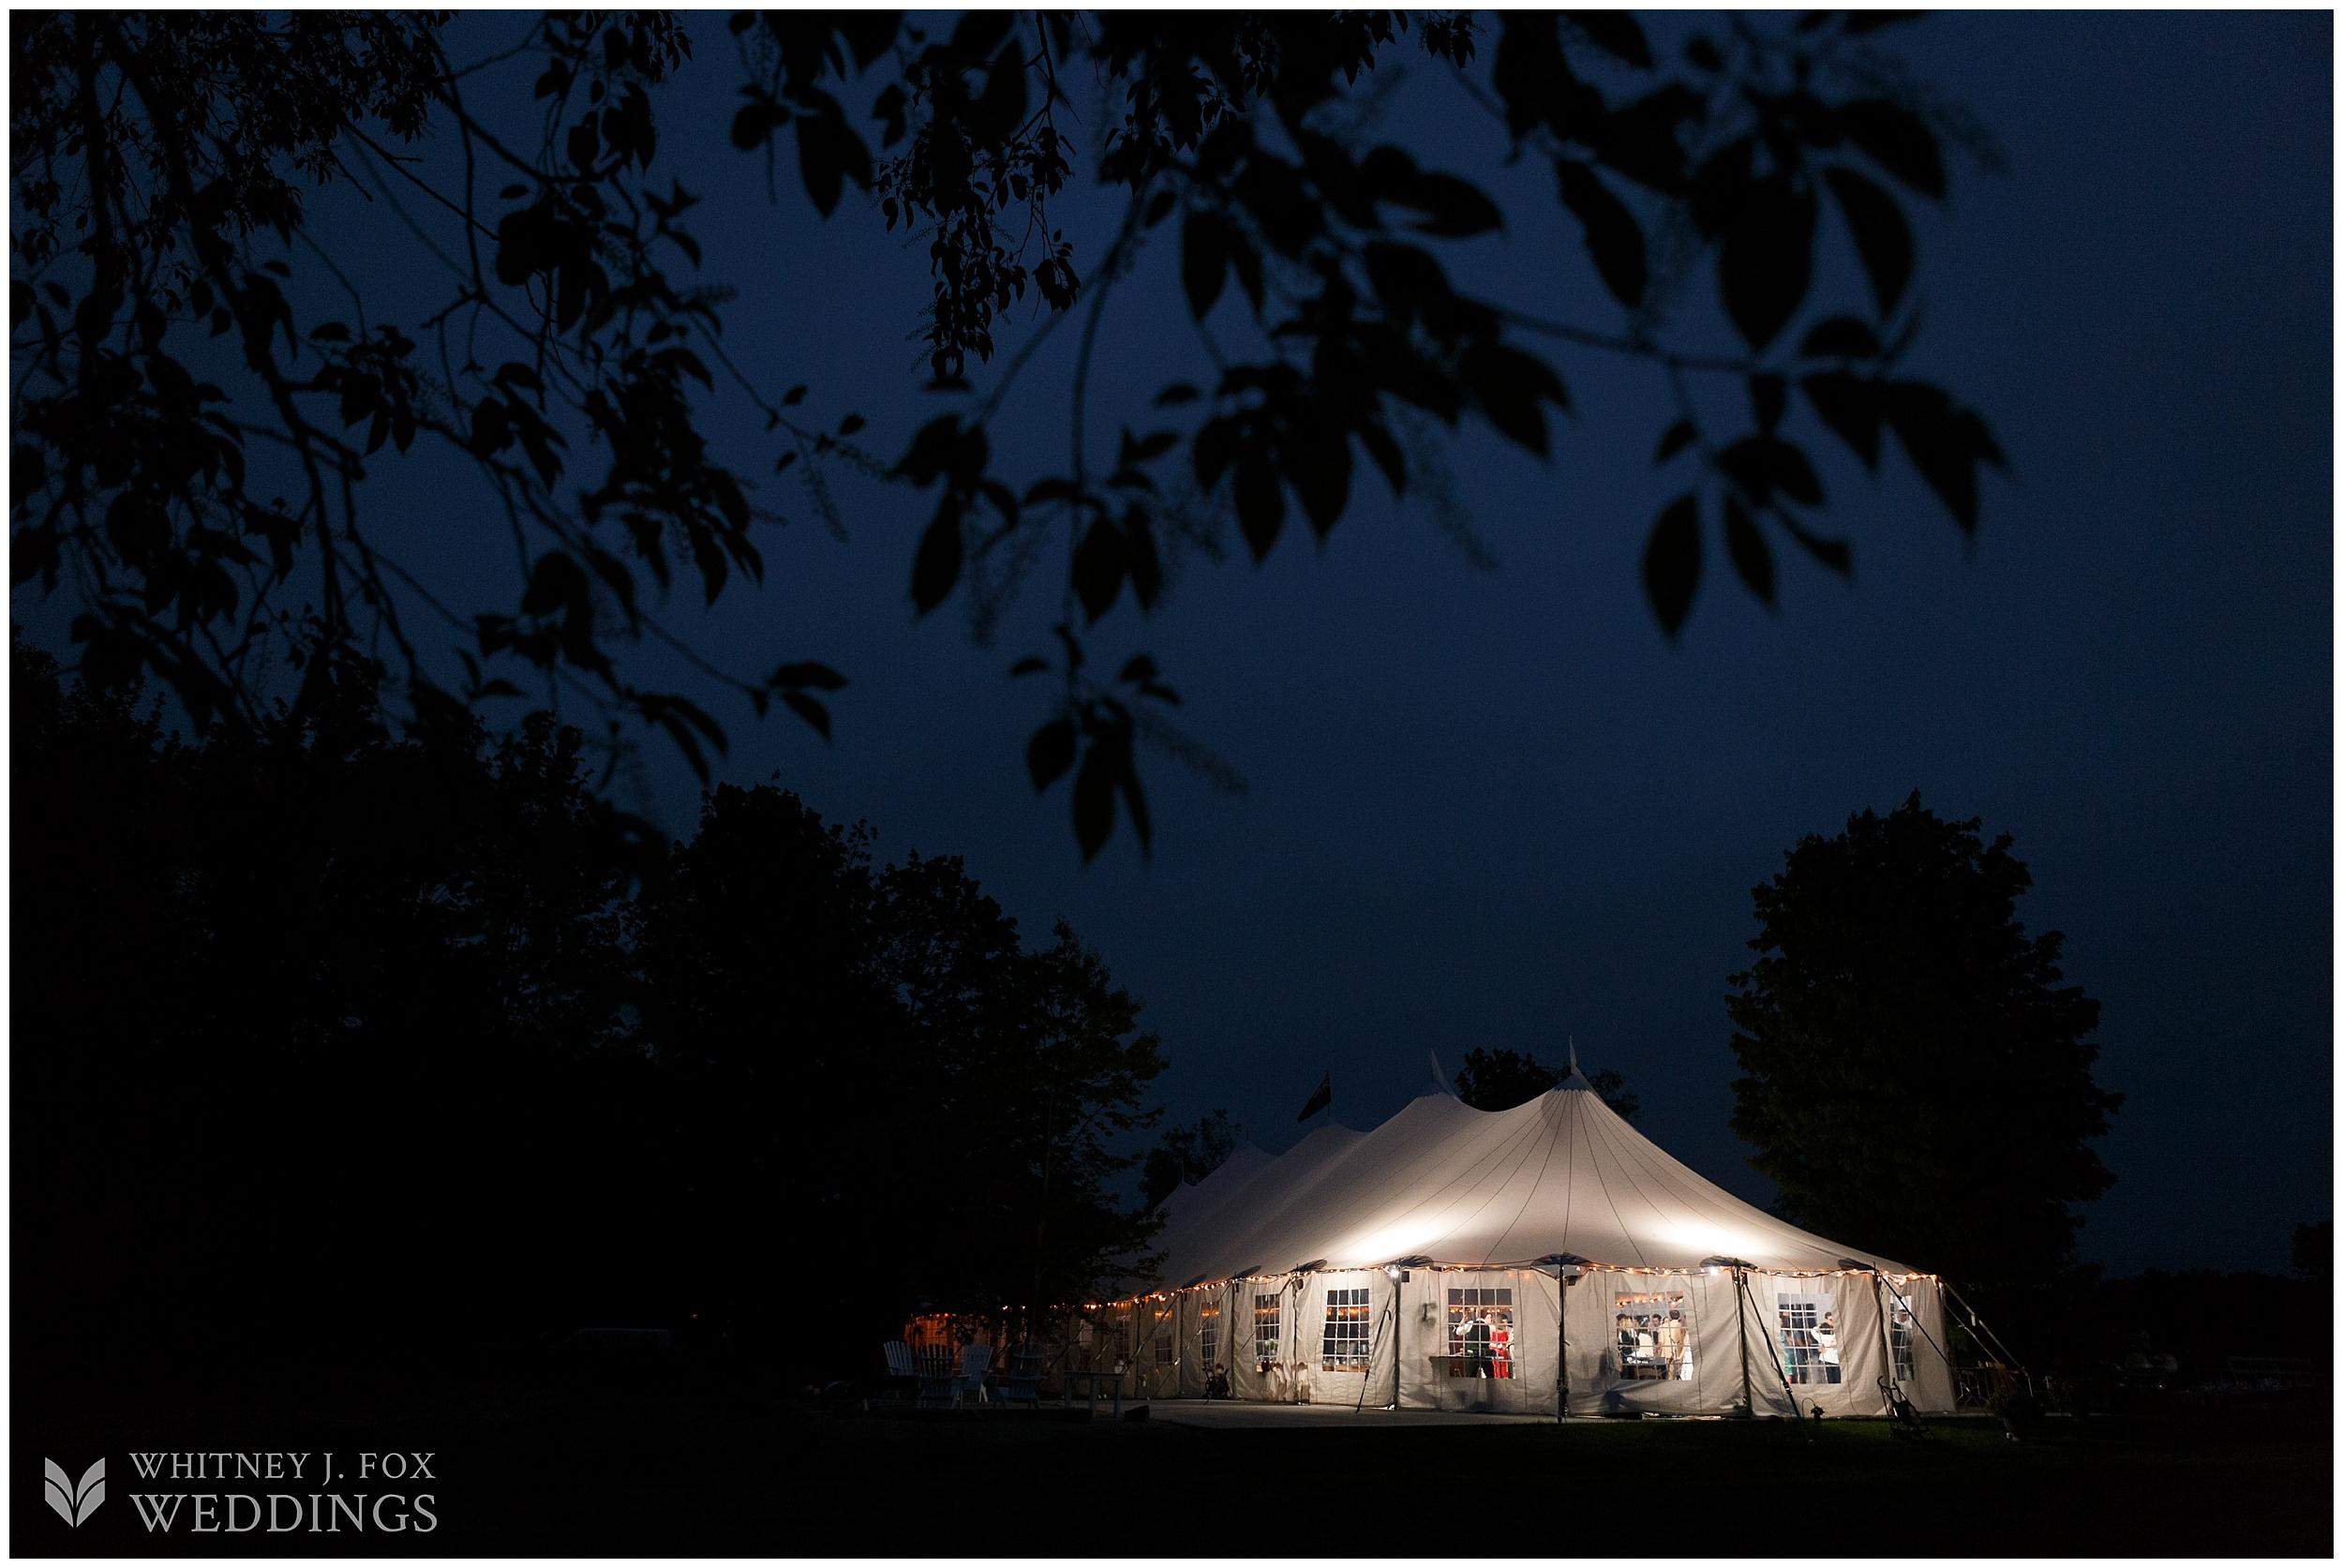 101_218_tai_josh_the_homestead_rest_be_thankful_farm_lyman_maine_photographer_whitney_j_fox_weddings_2397.jpg